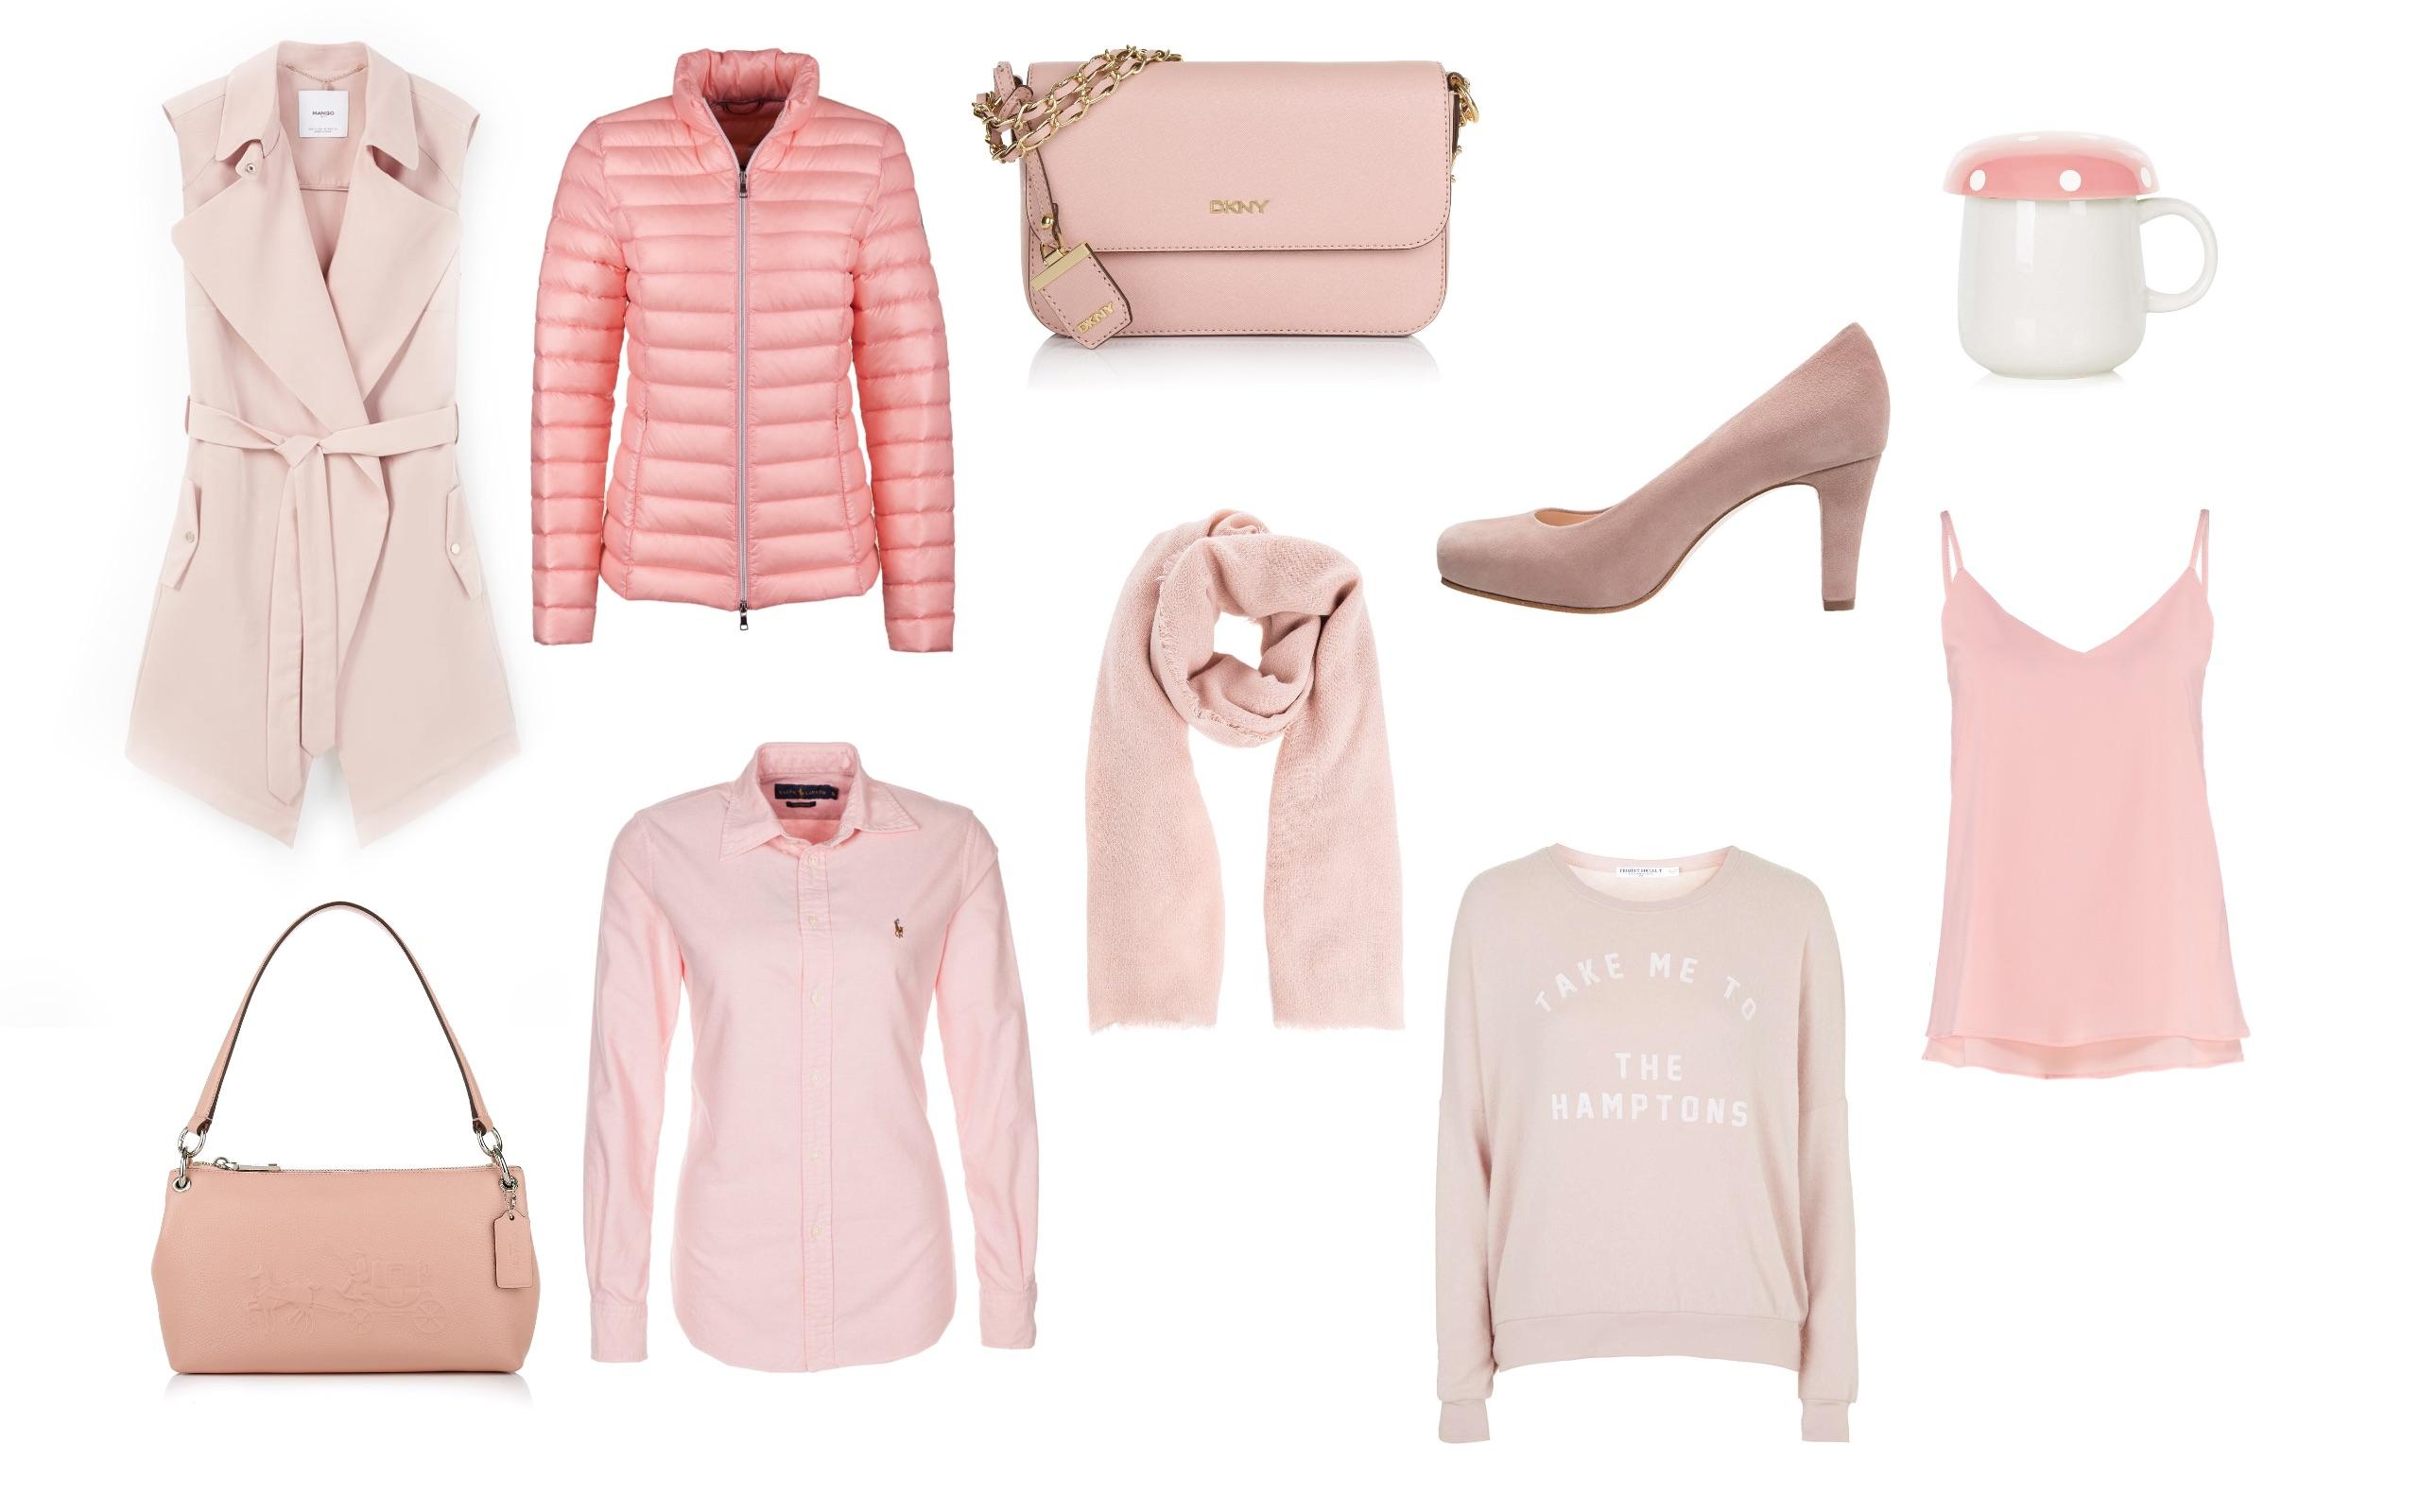 Fashion picks in Rose Quartz & Serenity